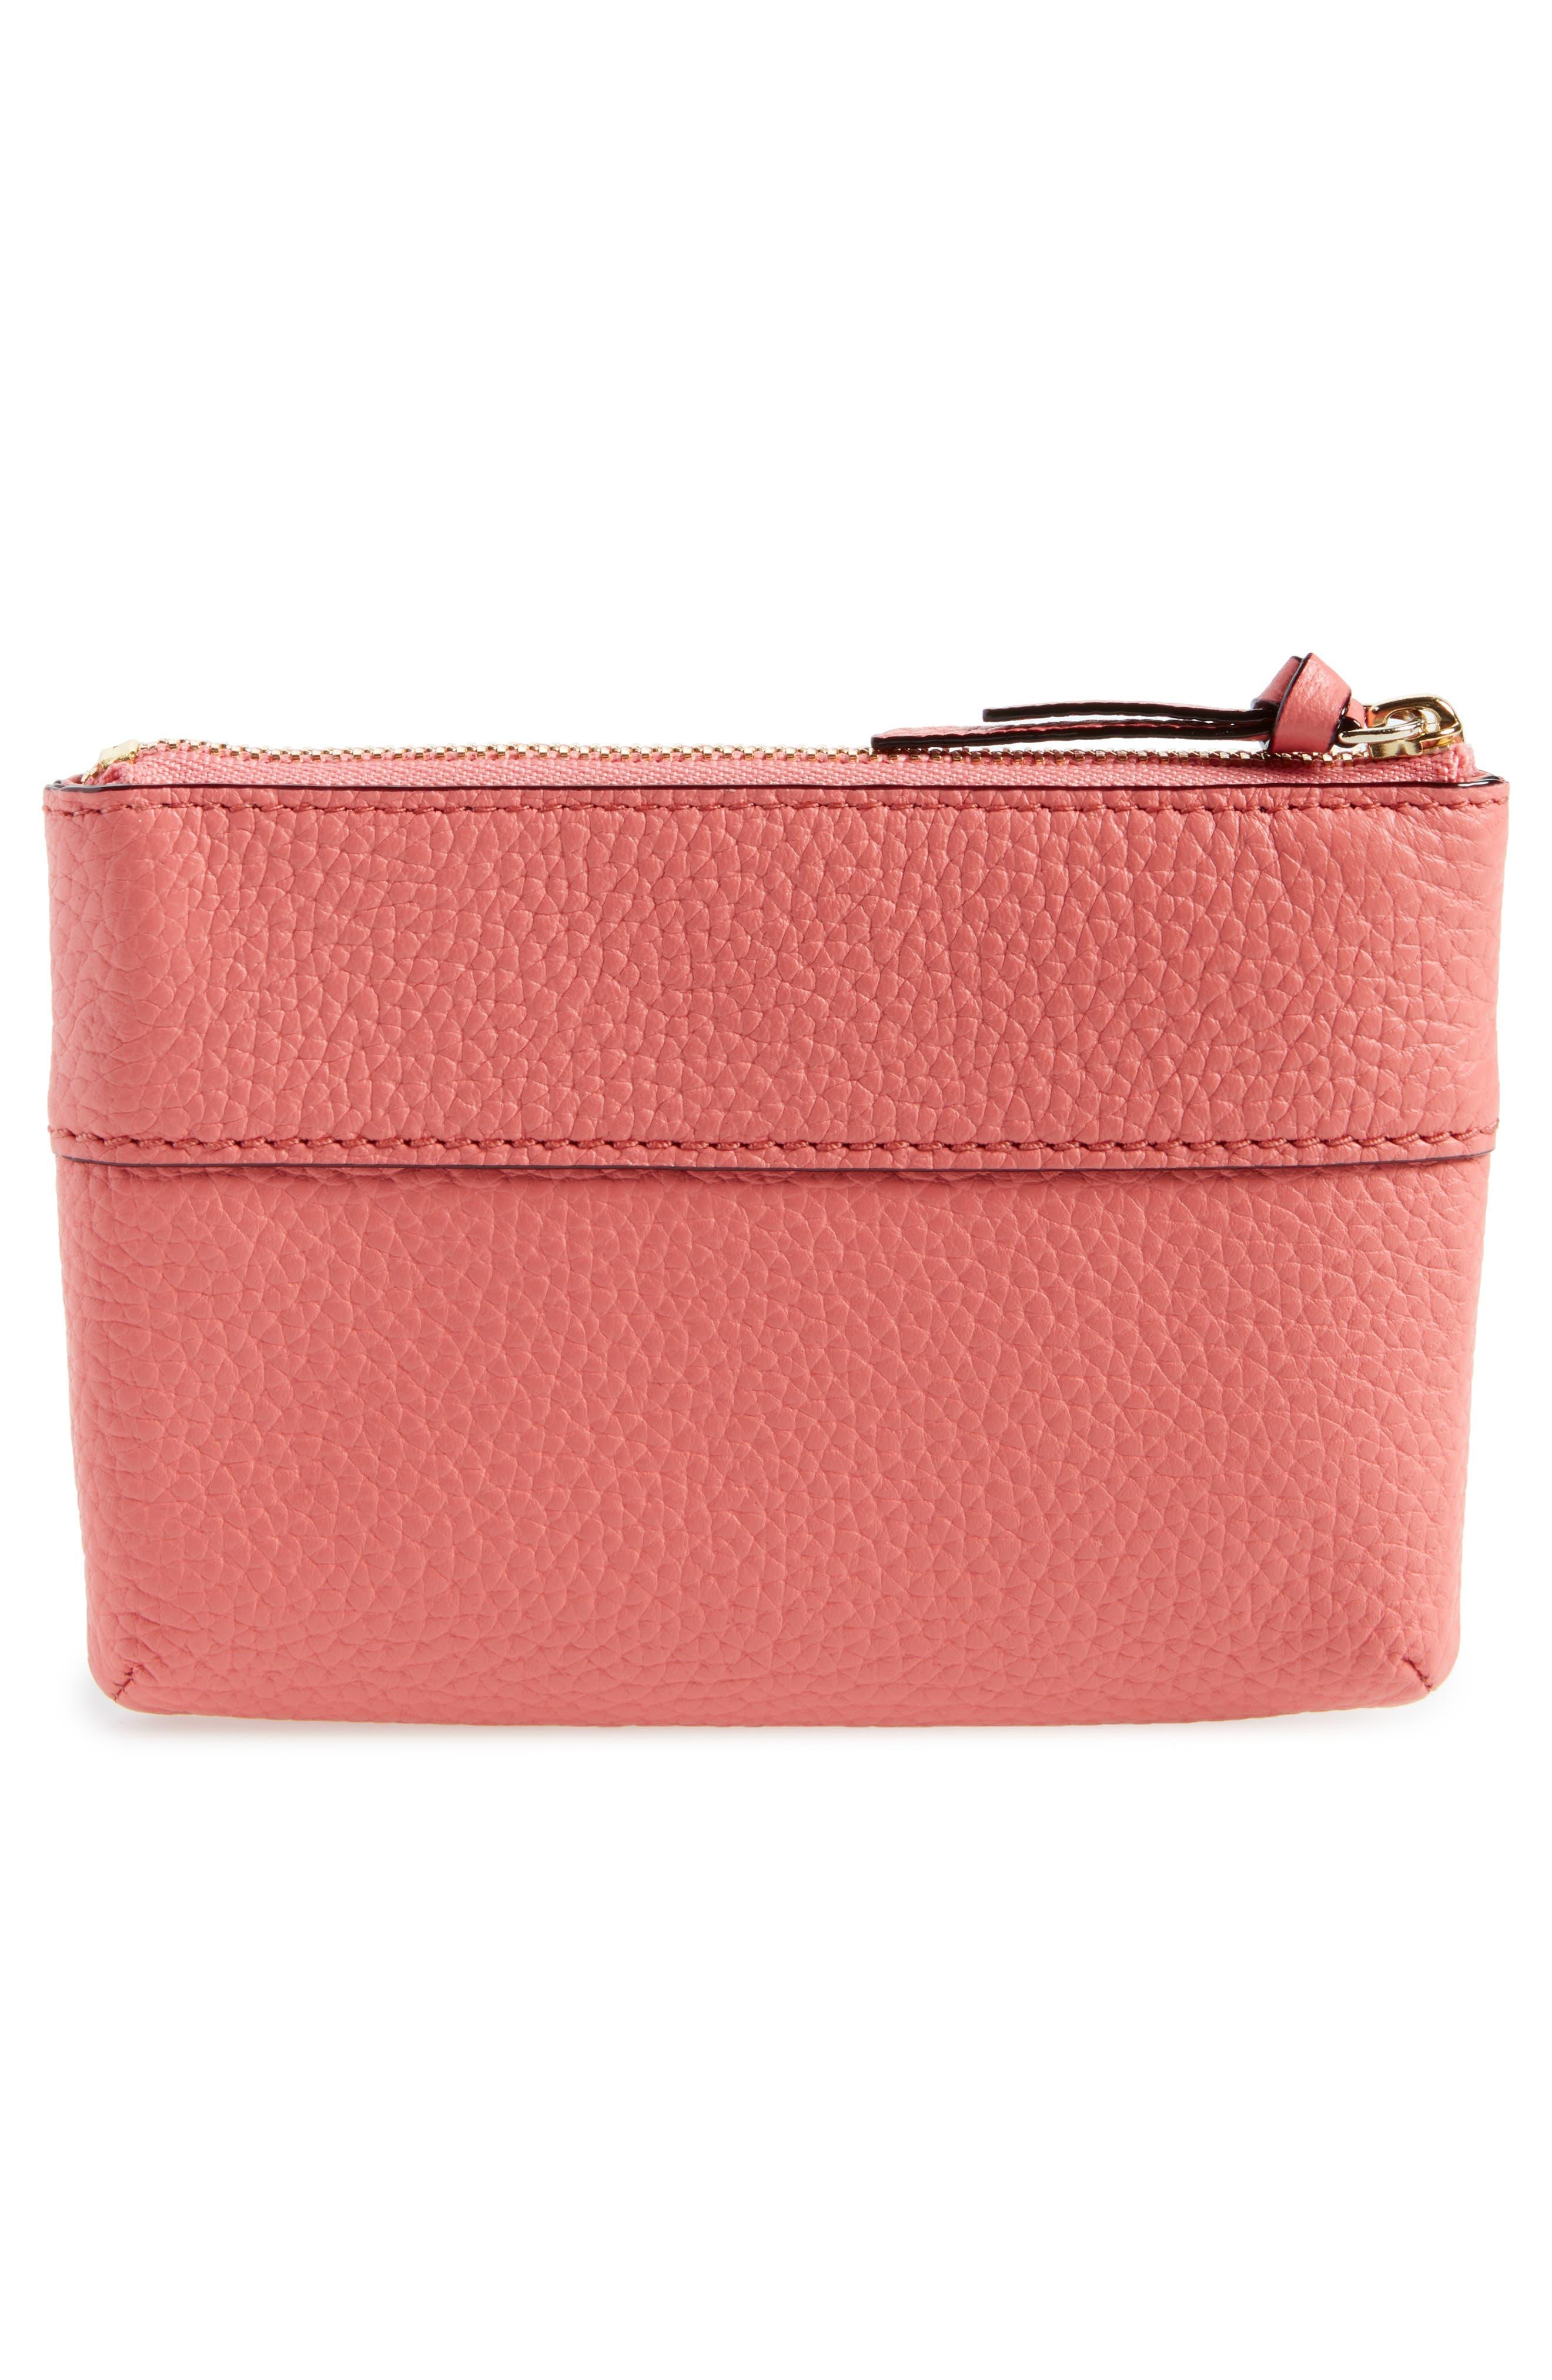 jackson street mila leather zip pouch,                             Alternate thumbnail 3, color,                             Coral Pebble